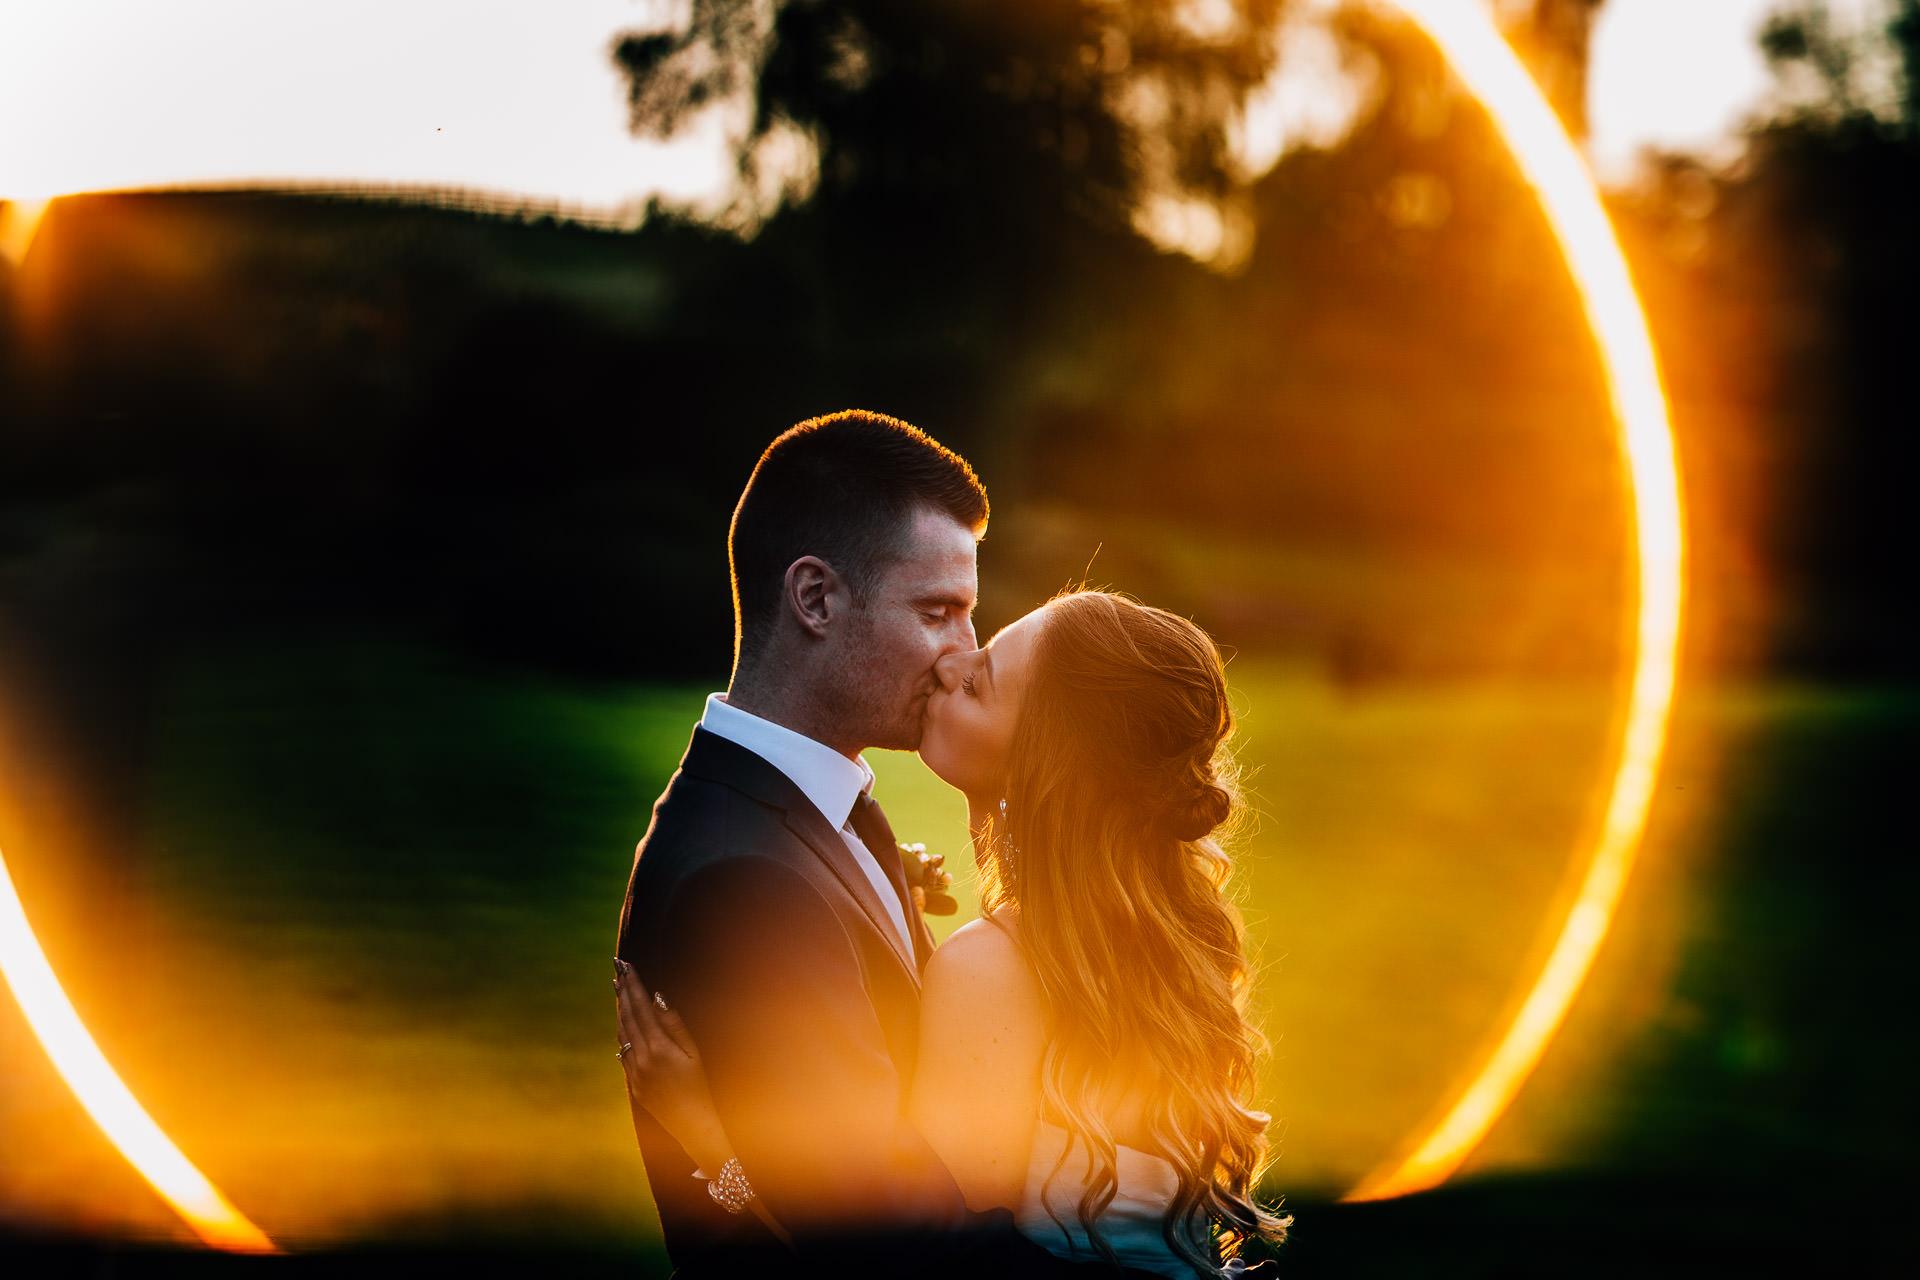 Weston Hall Wedding Photography - sun flare with couple